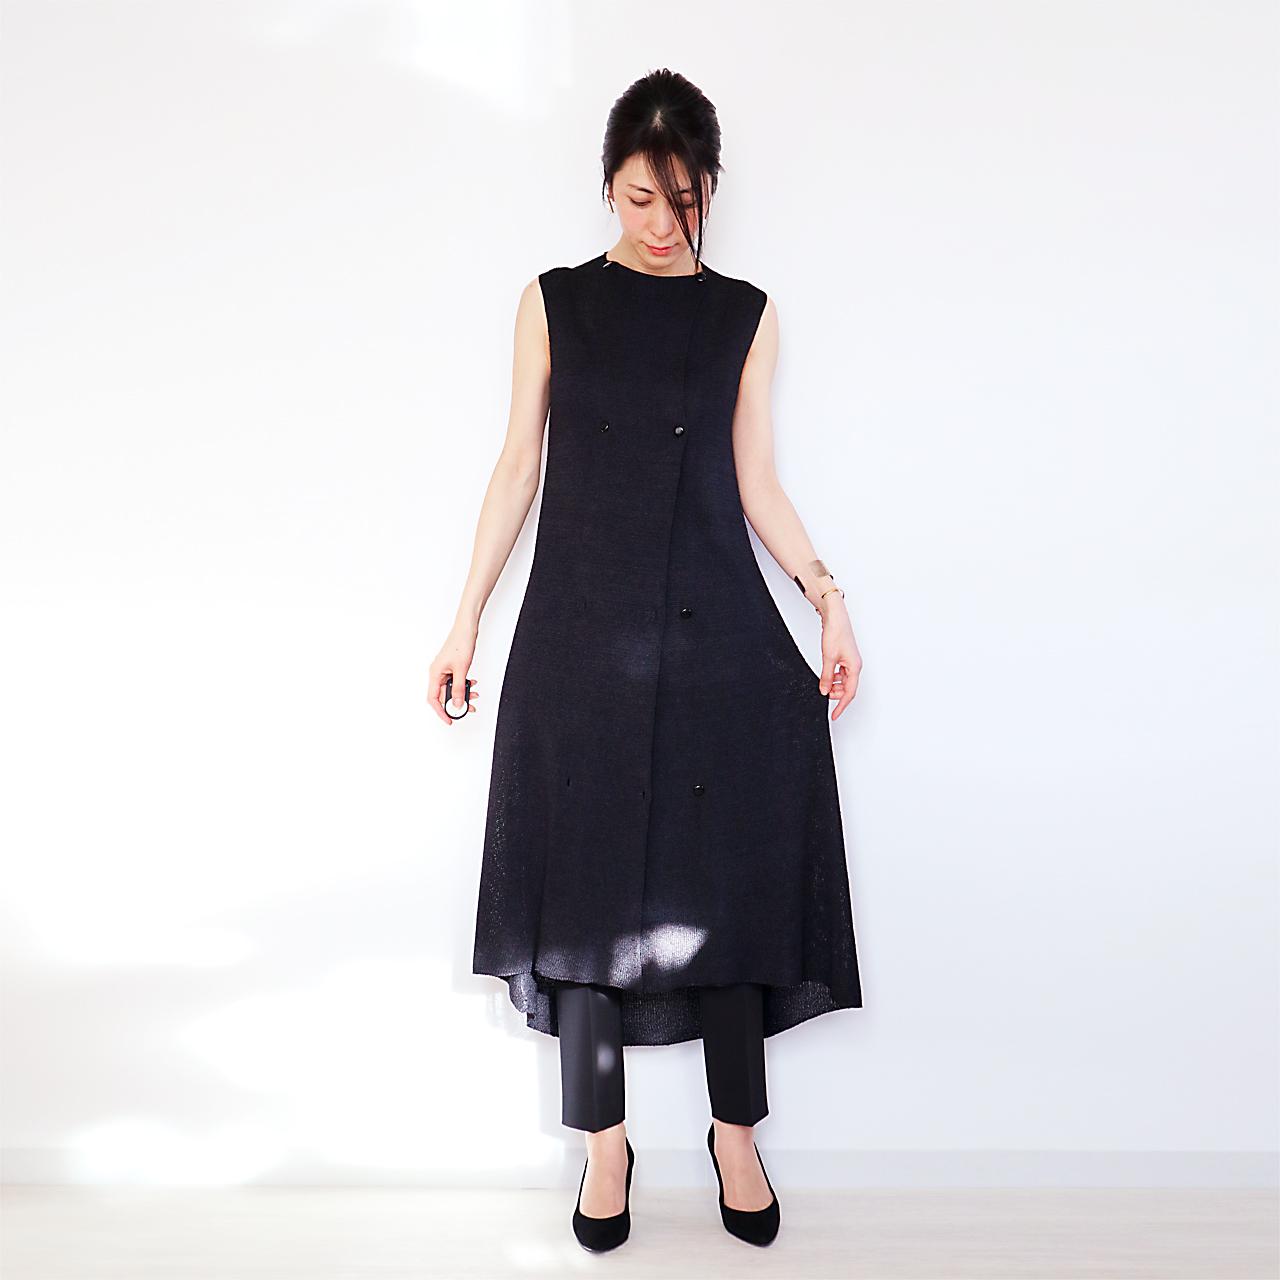 https://silkpiece.stores.jp/items/5c3dc9f9c49cf3332138beab